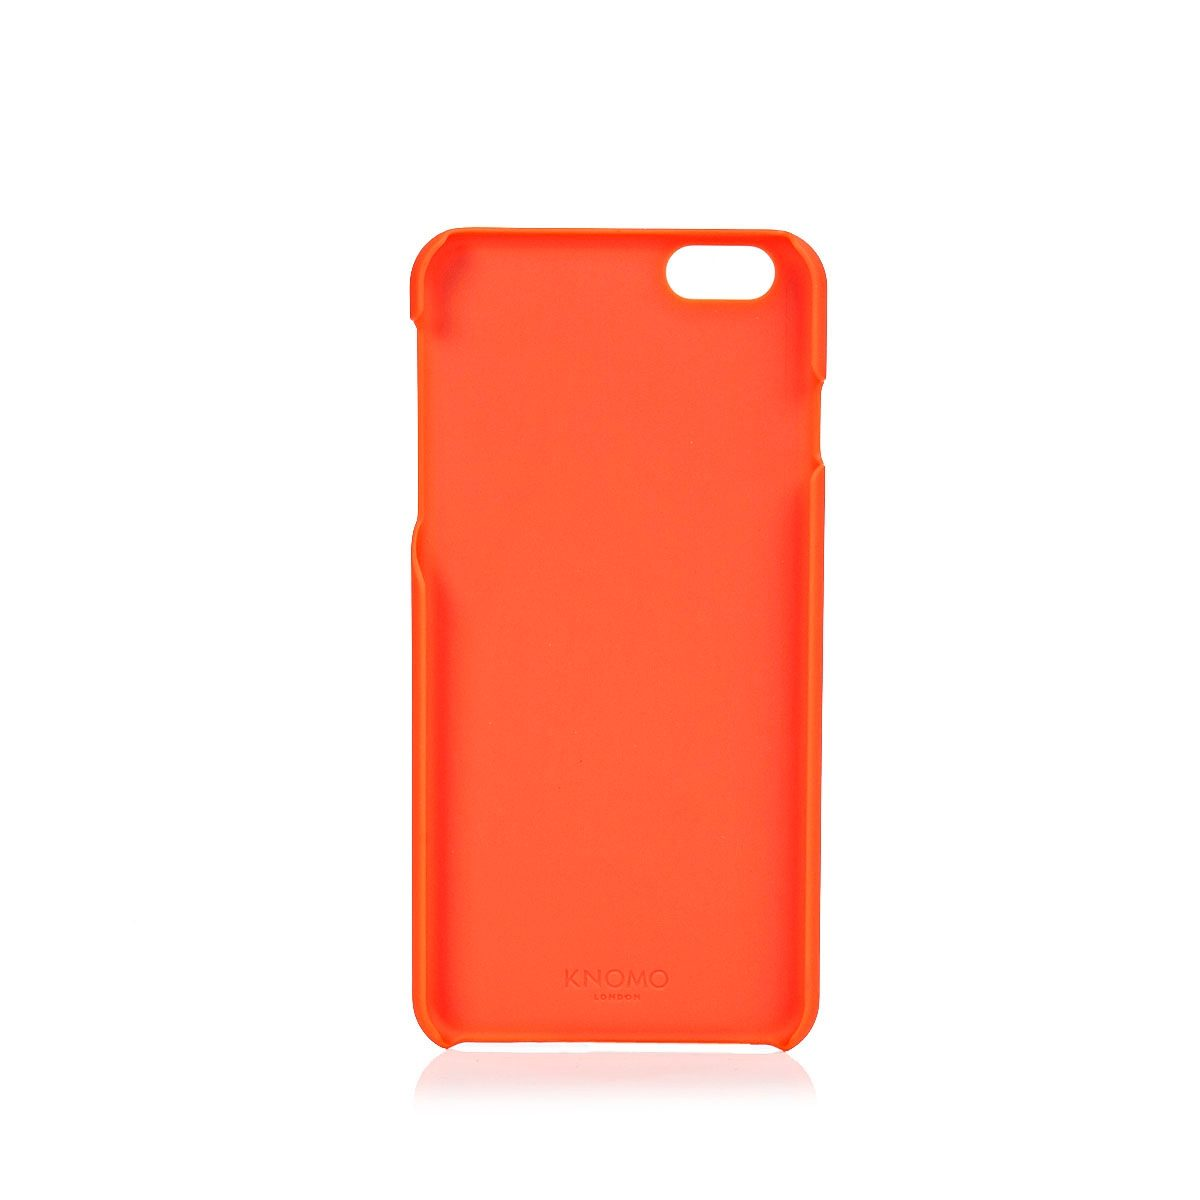 Knomo Smatphonecase Leder für iPhone 6 Plus, 6s Plus »Open Face Snap on Case «